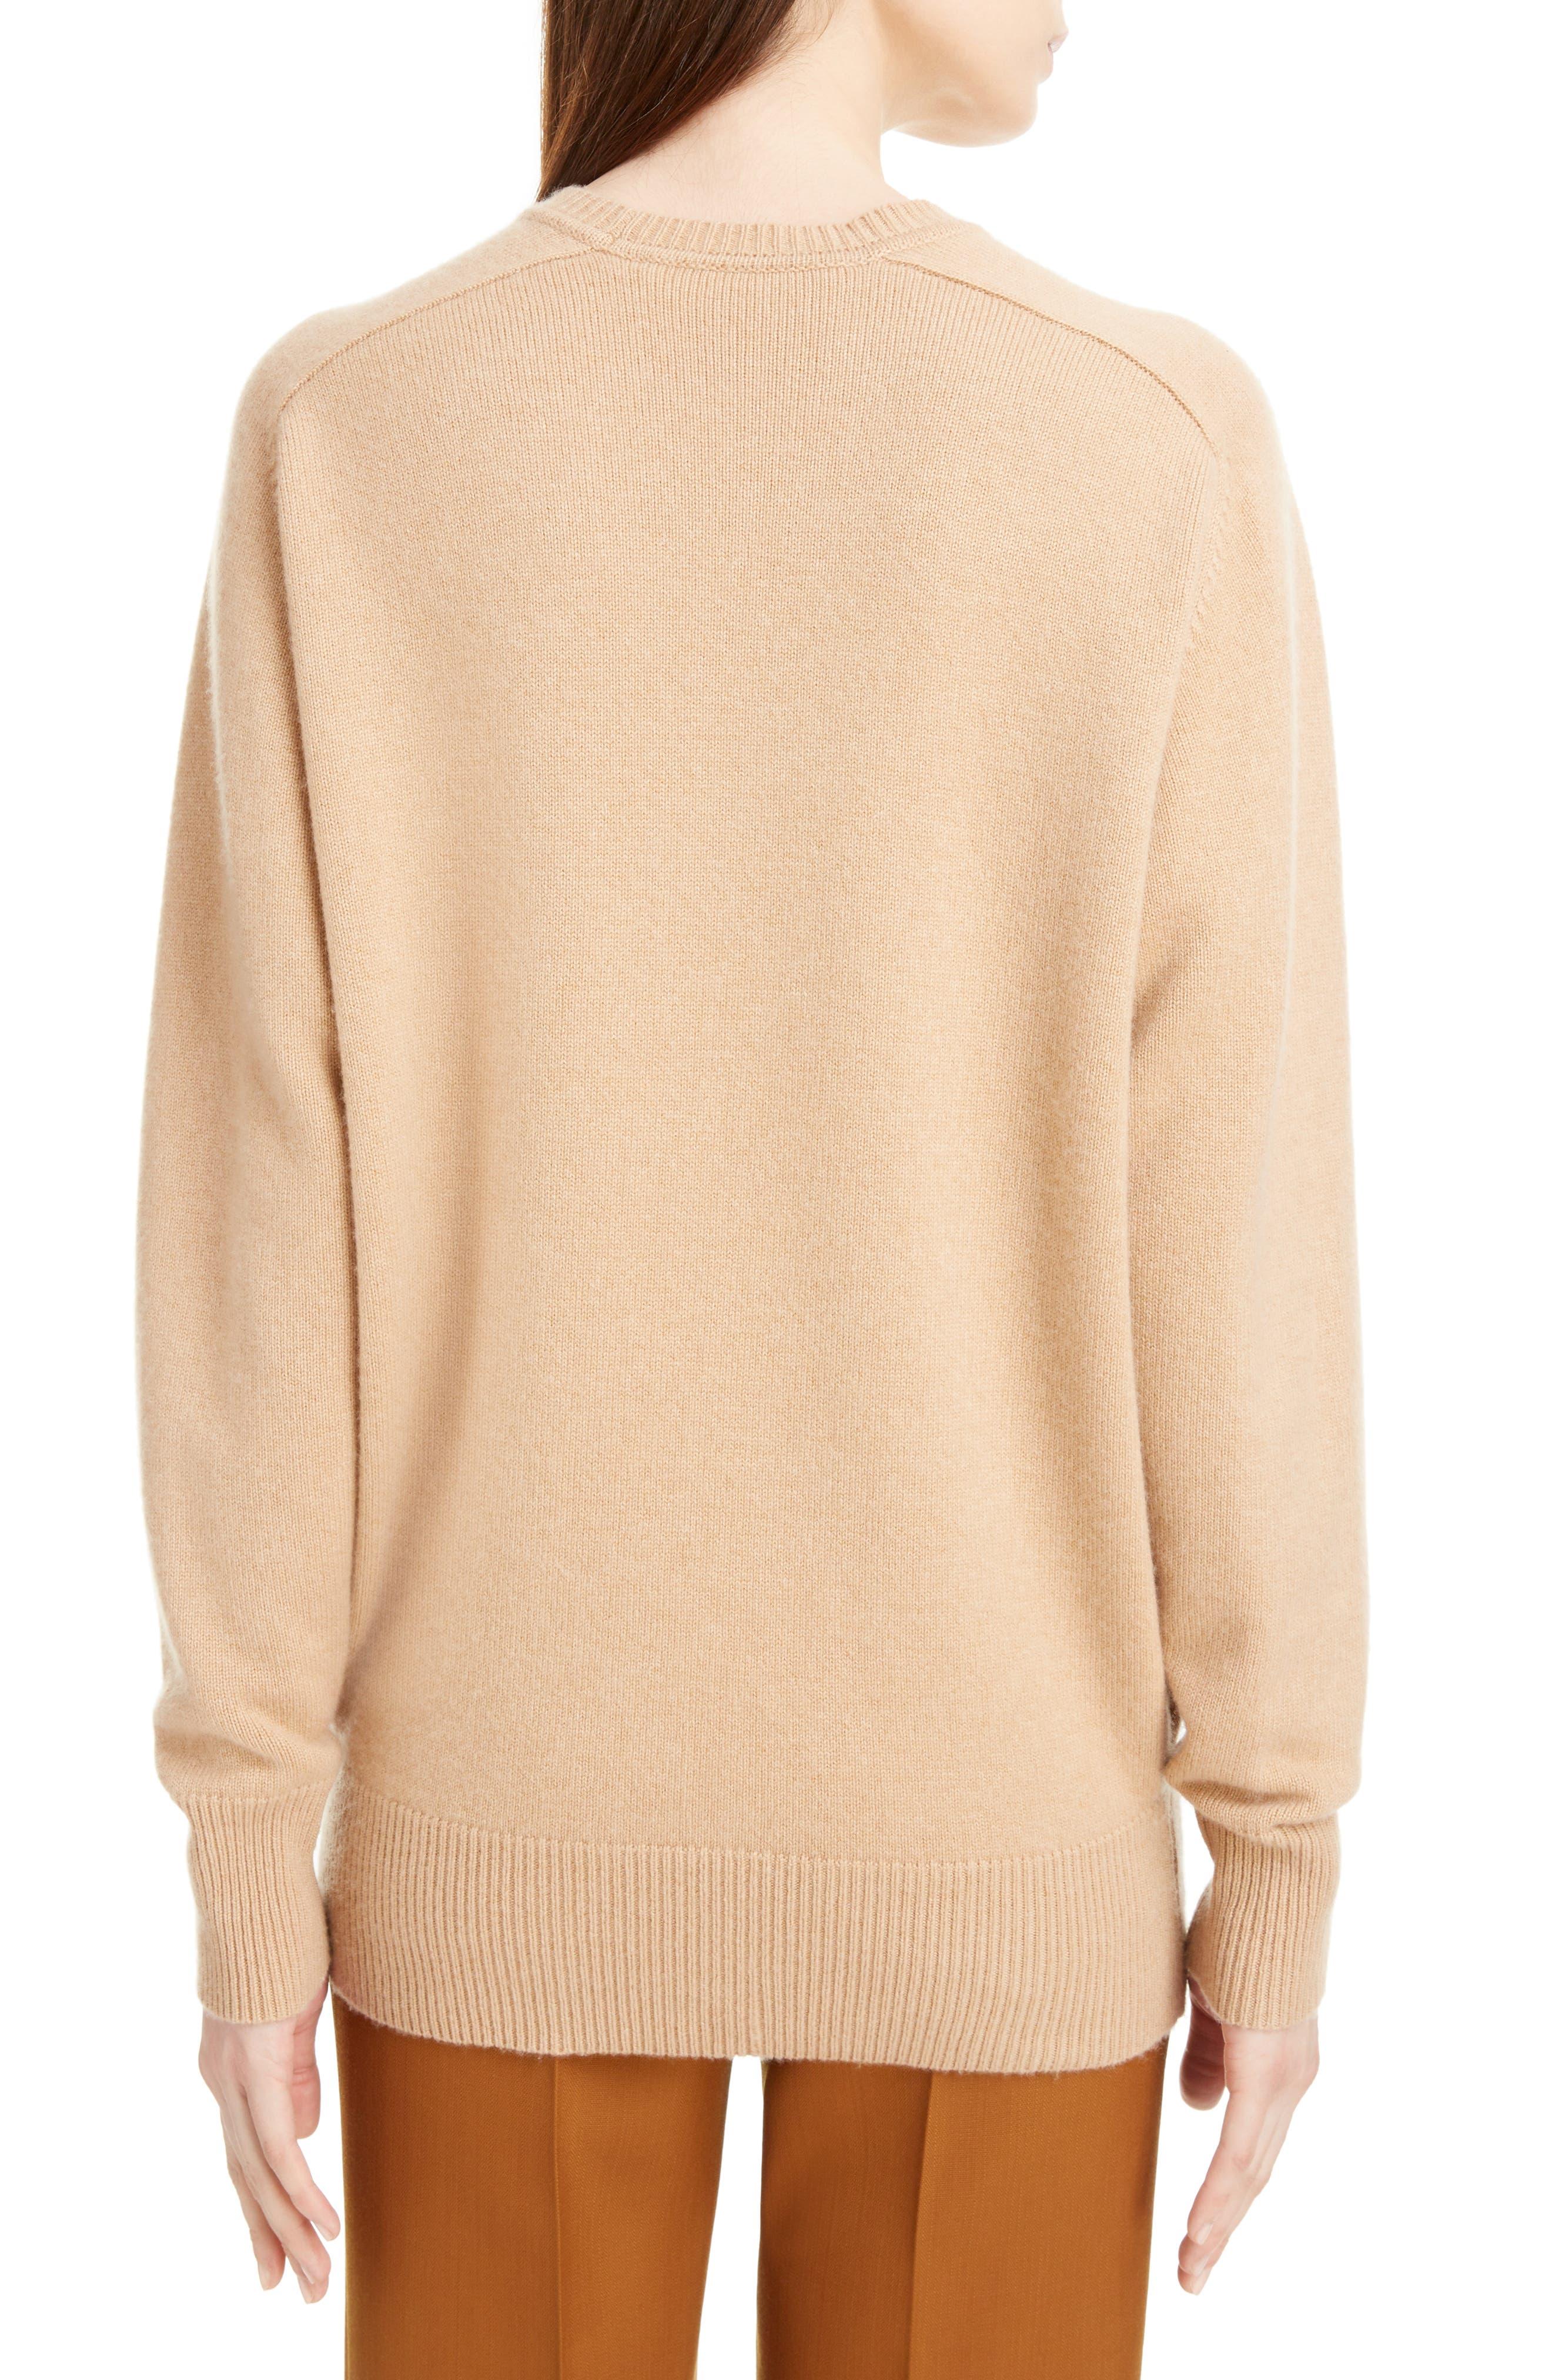 VICTORIA BECKHAM, Cashmere Blend Sweater, Alternate thumbnail 2, color, LIGHT CAMEL